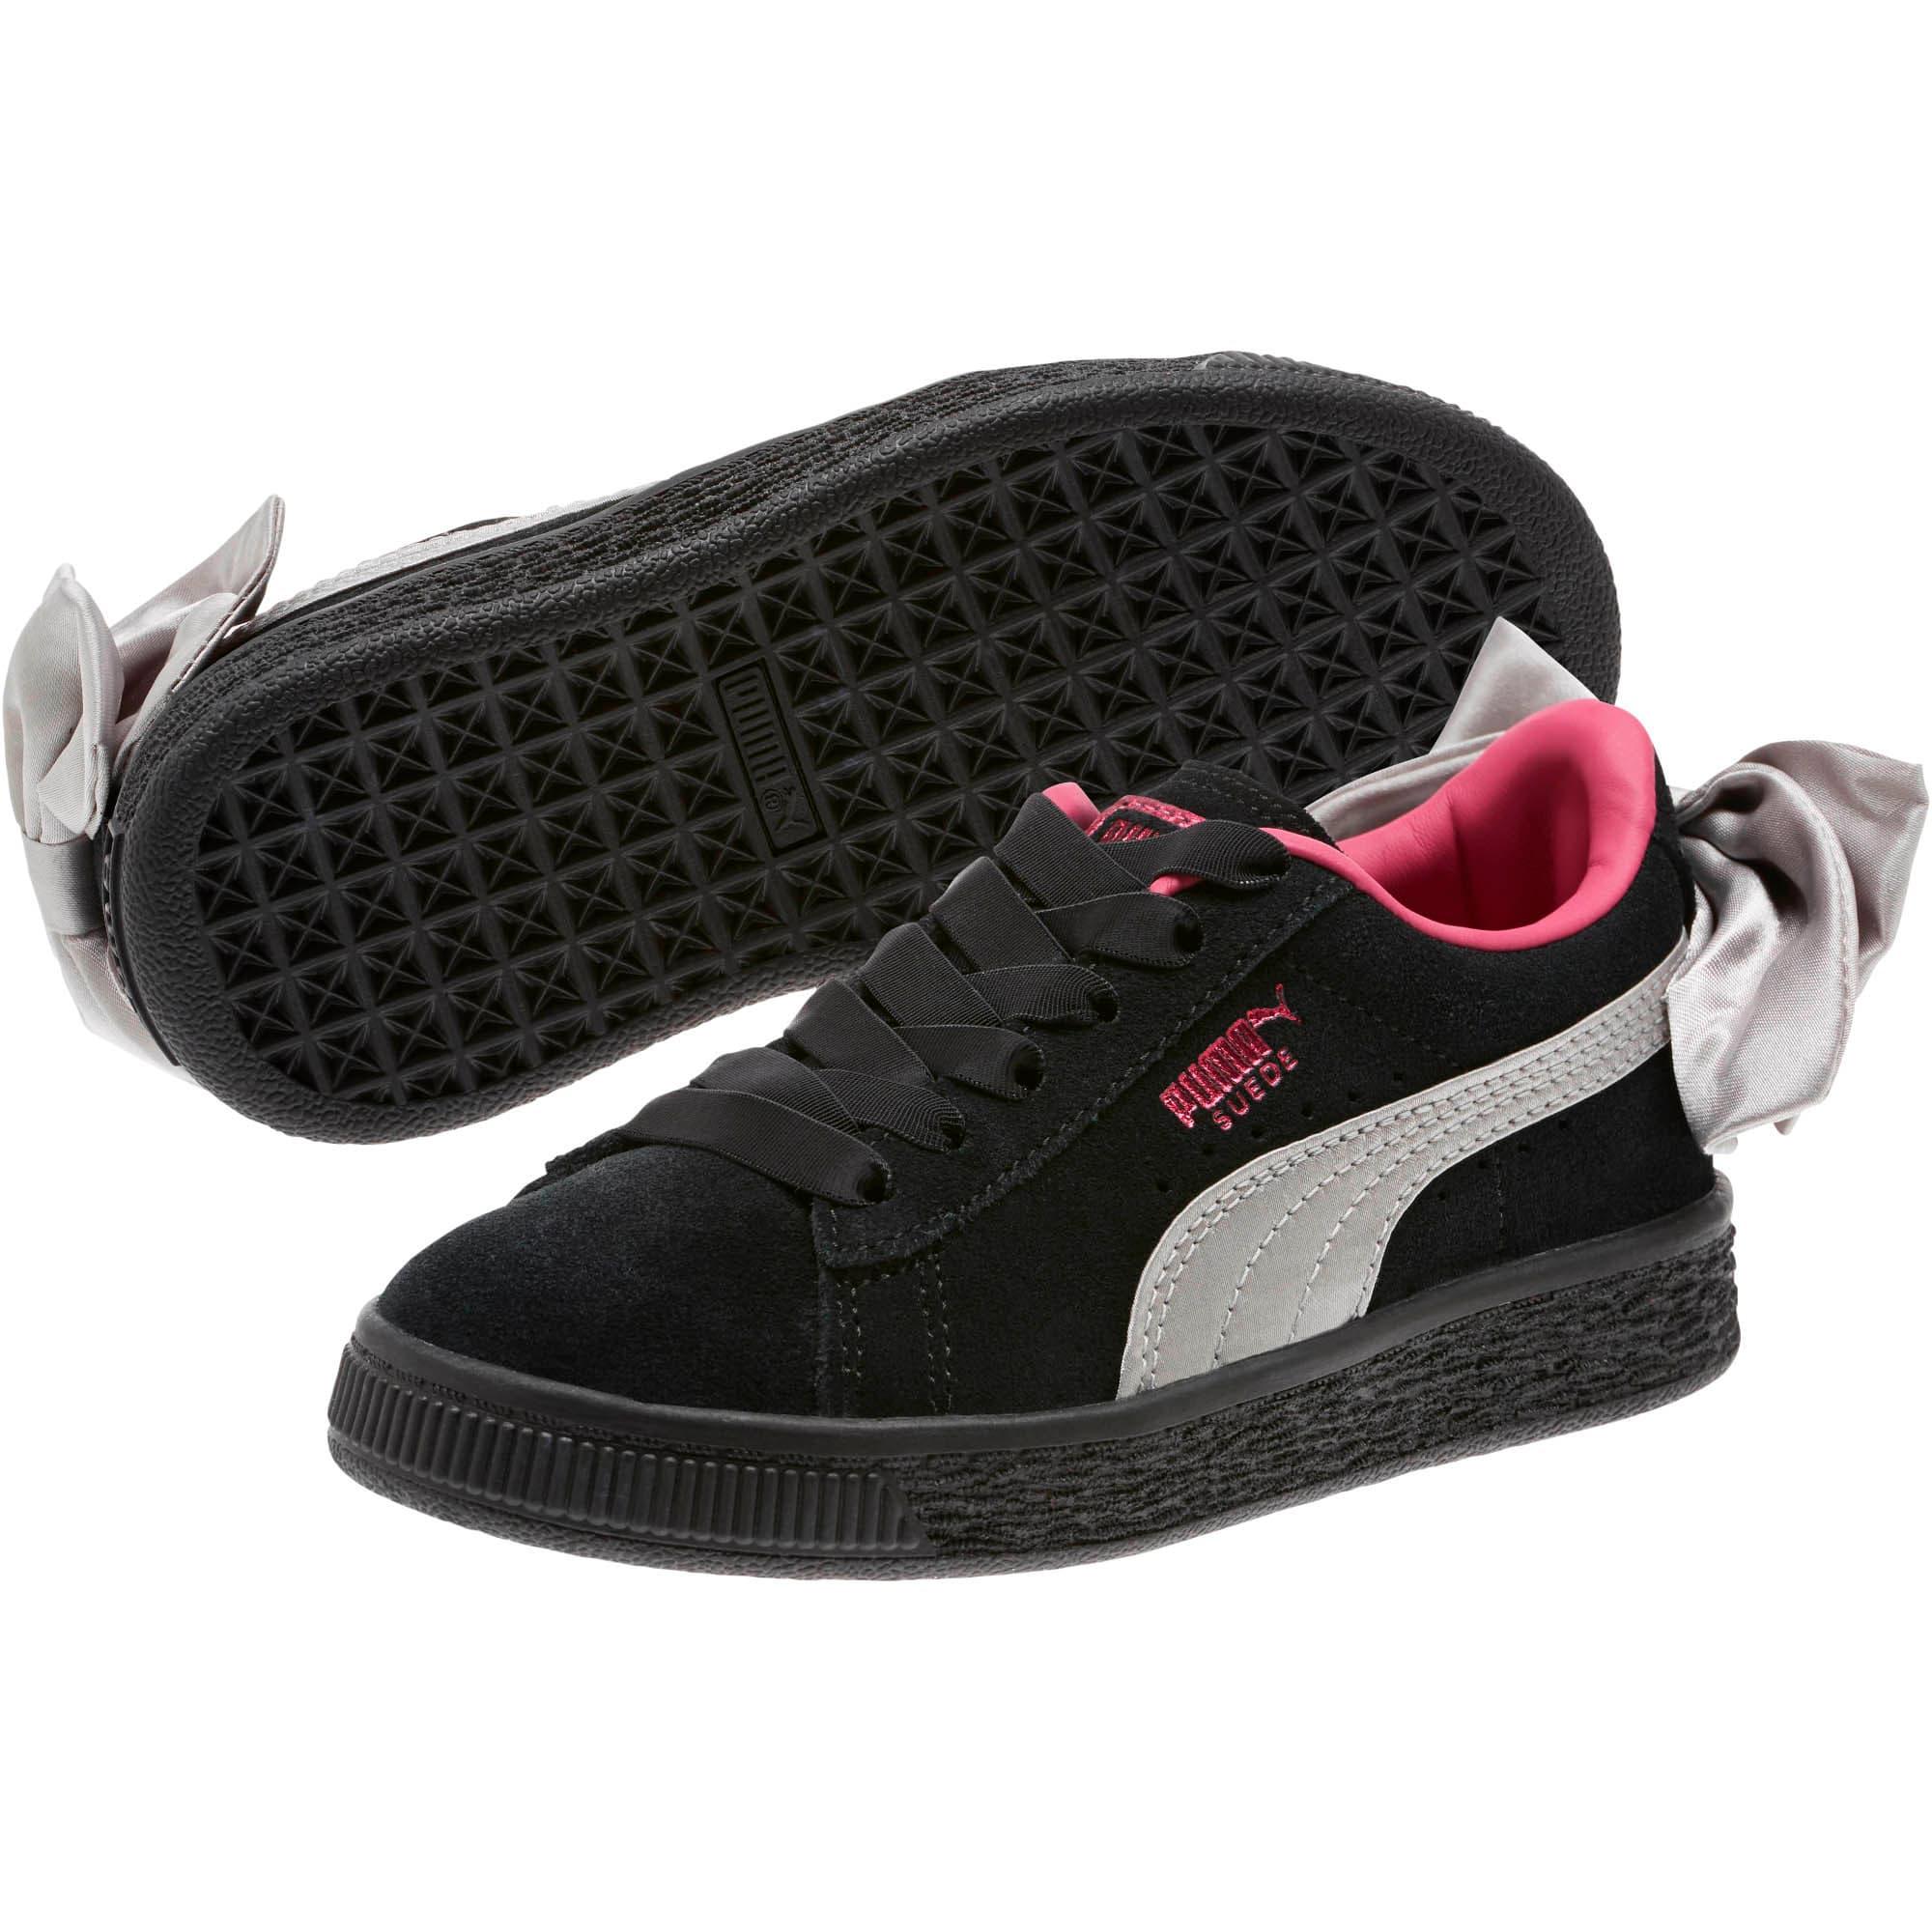 Thumbnail 2 of Suede Bow AC Little Kids' Shoes, Puma Black-Fuchsia Purple, medium